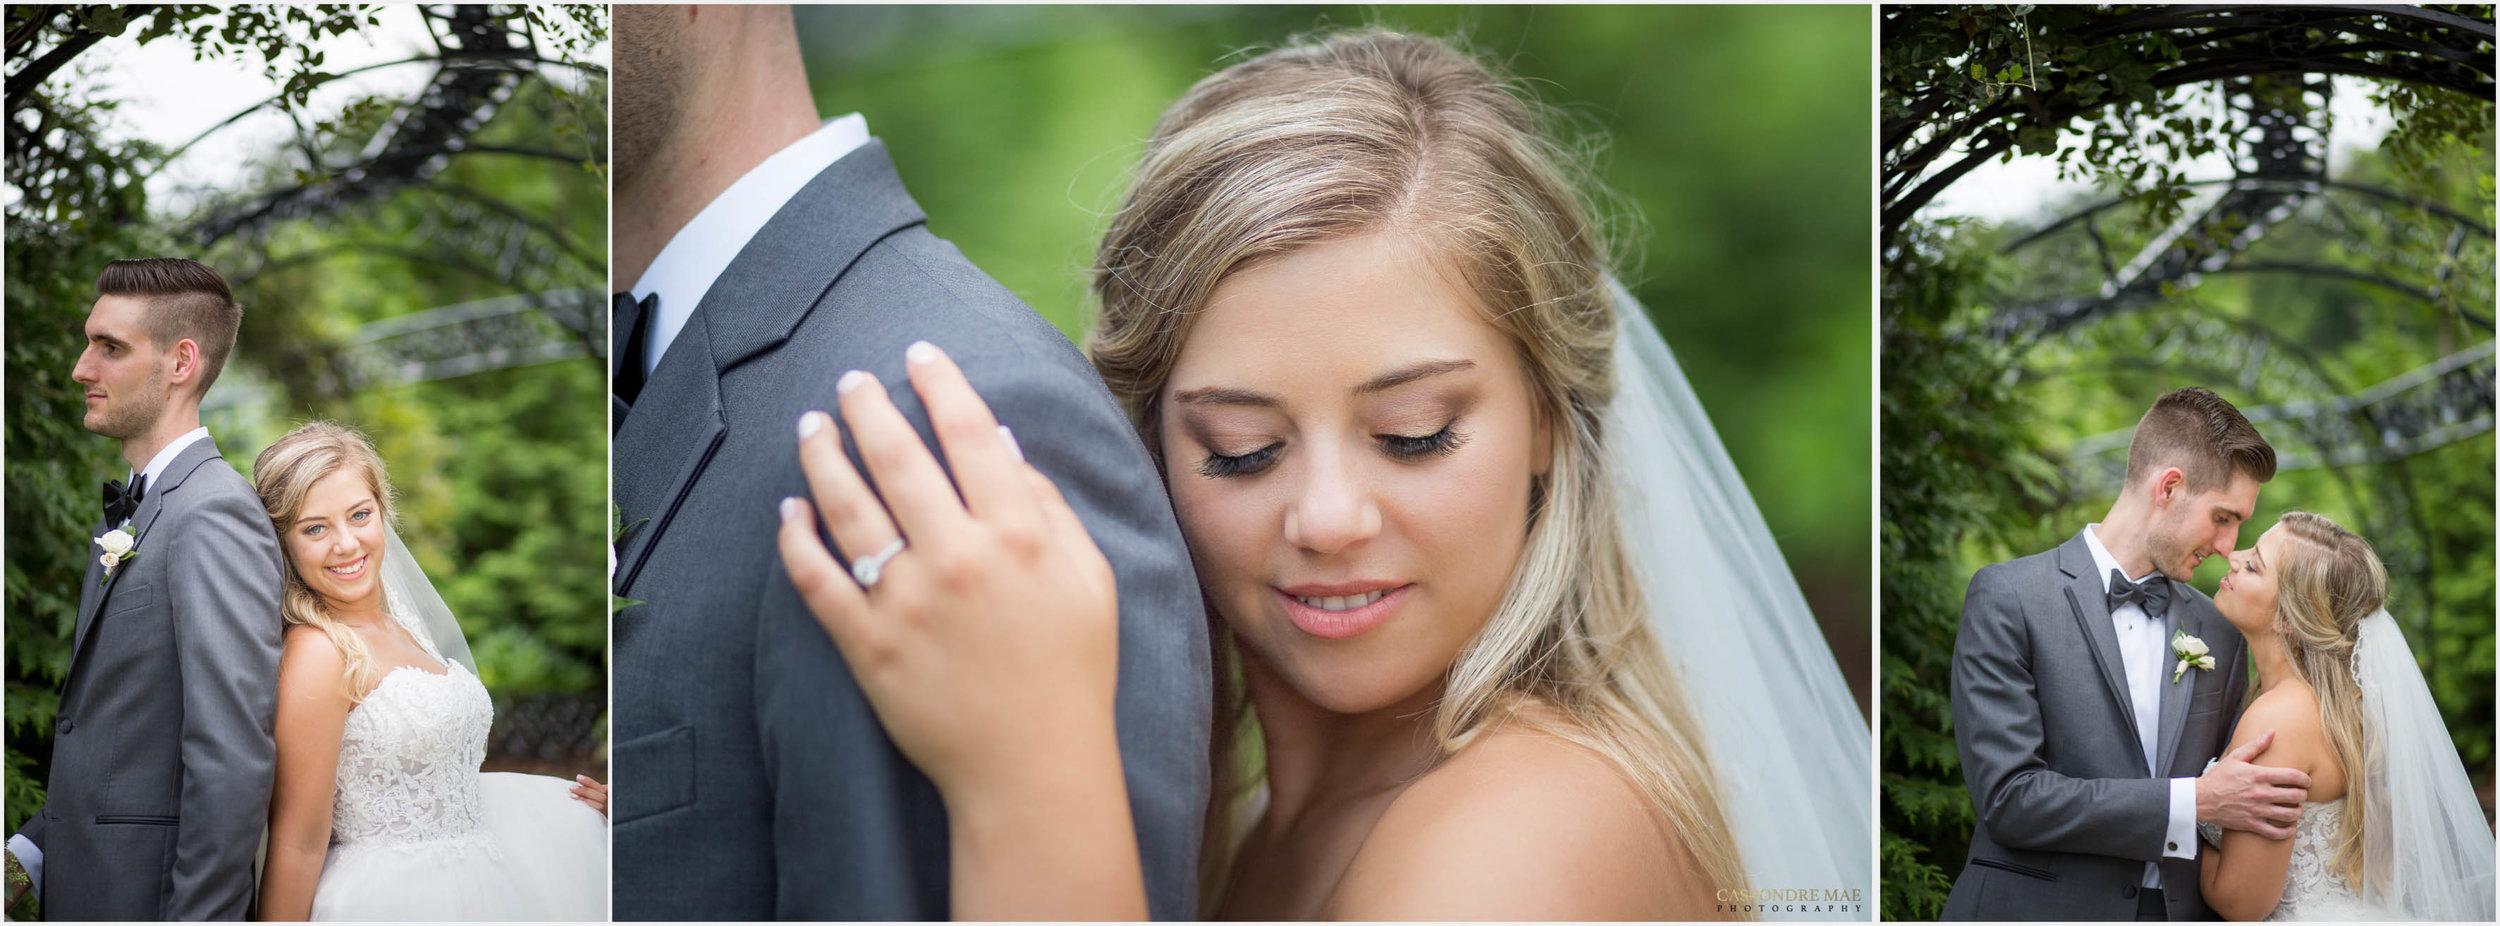 Cassondre Mae Photography Hudson Valley NY Wedding Photographer -19.jpg